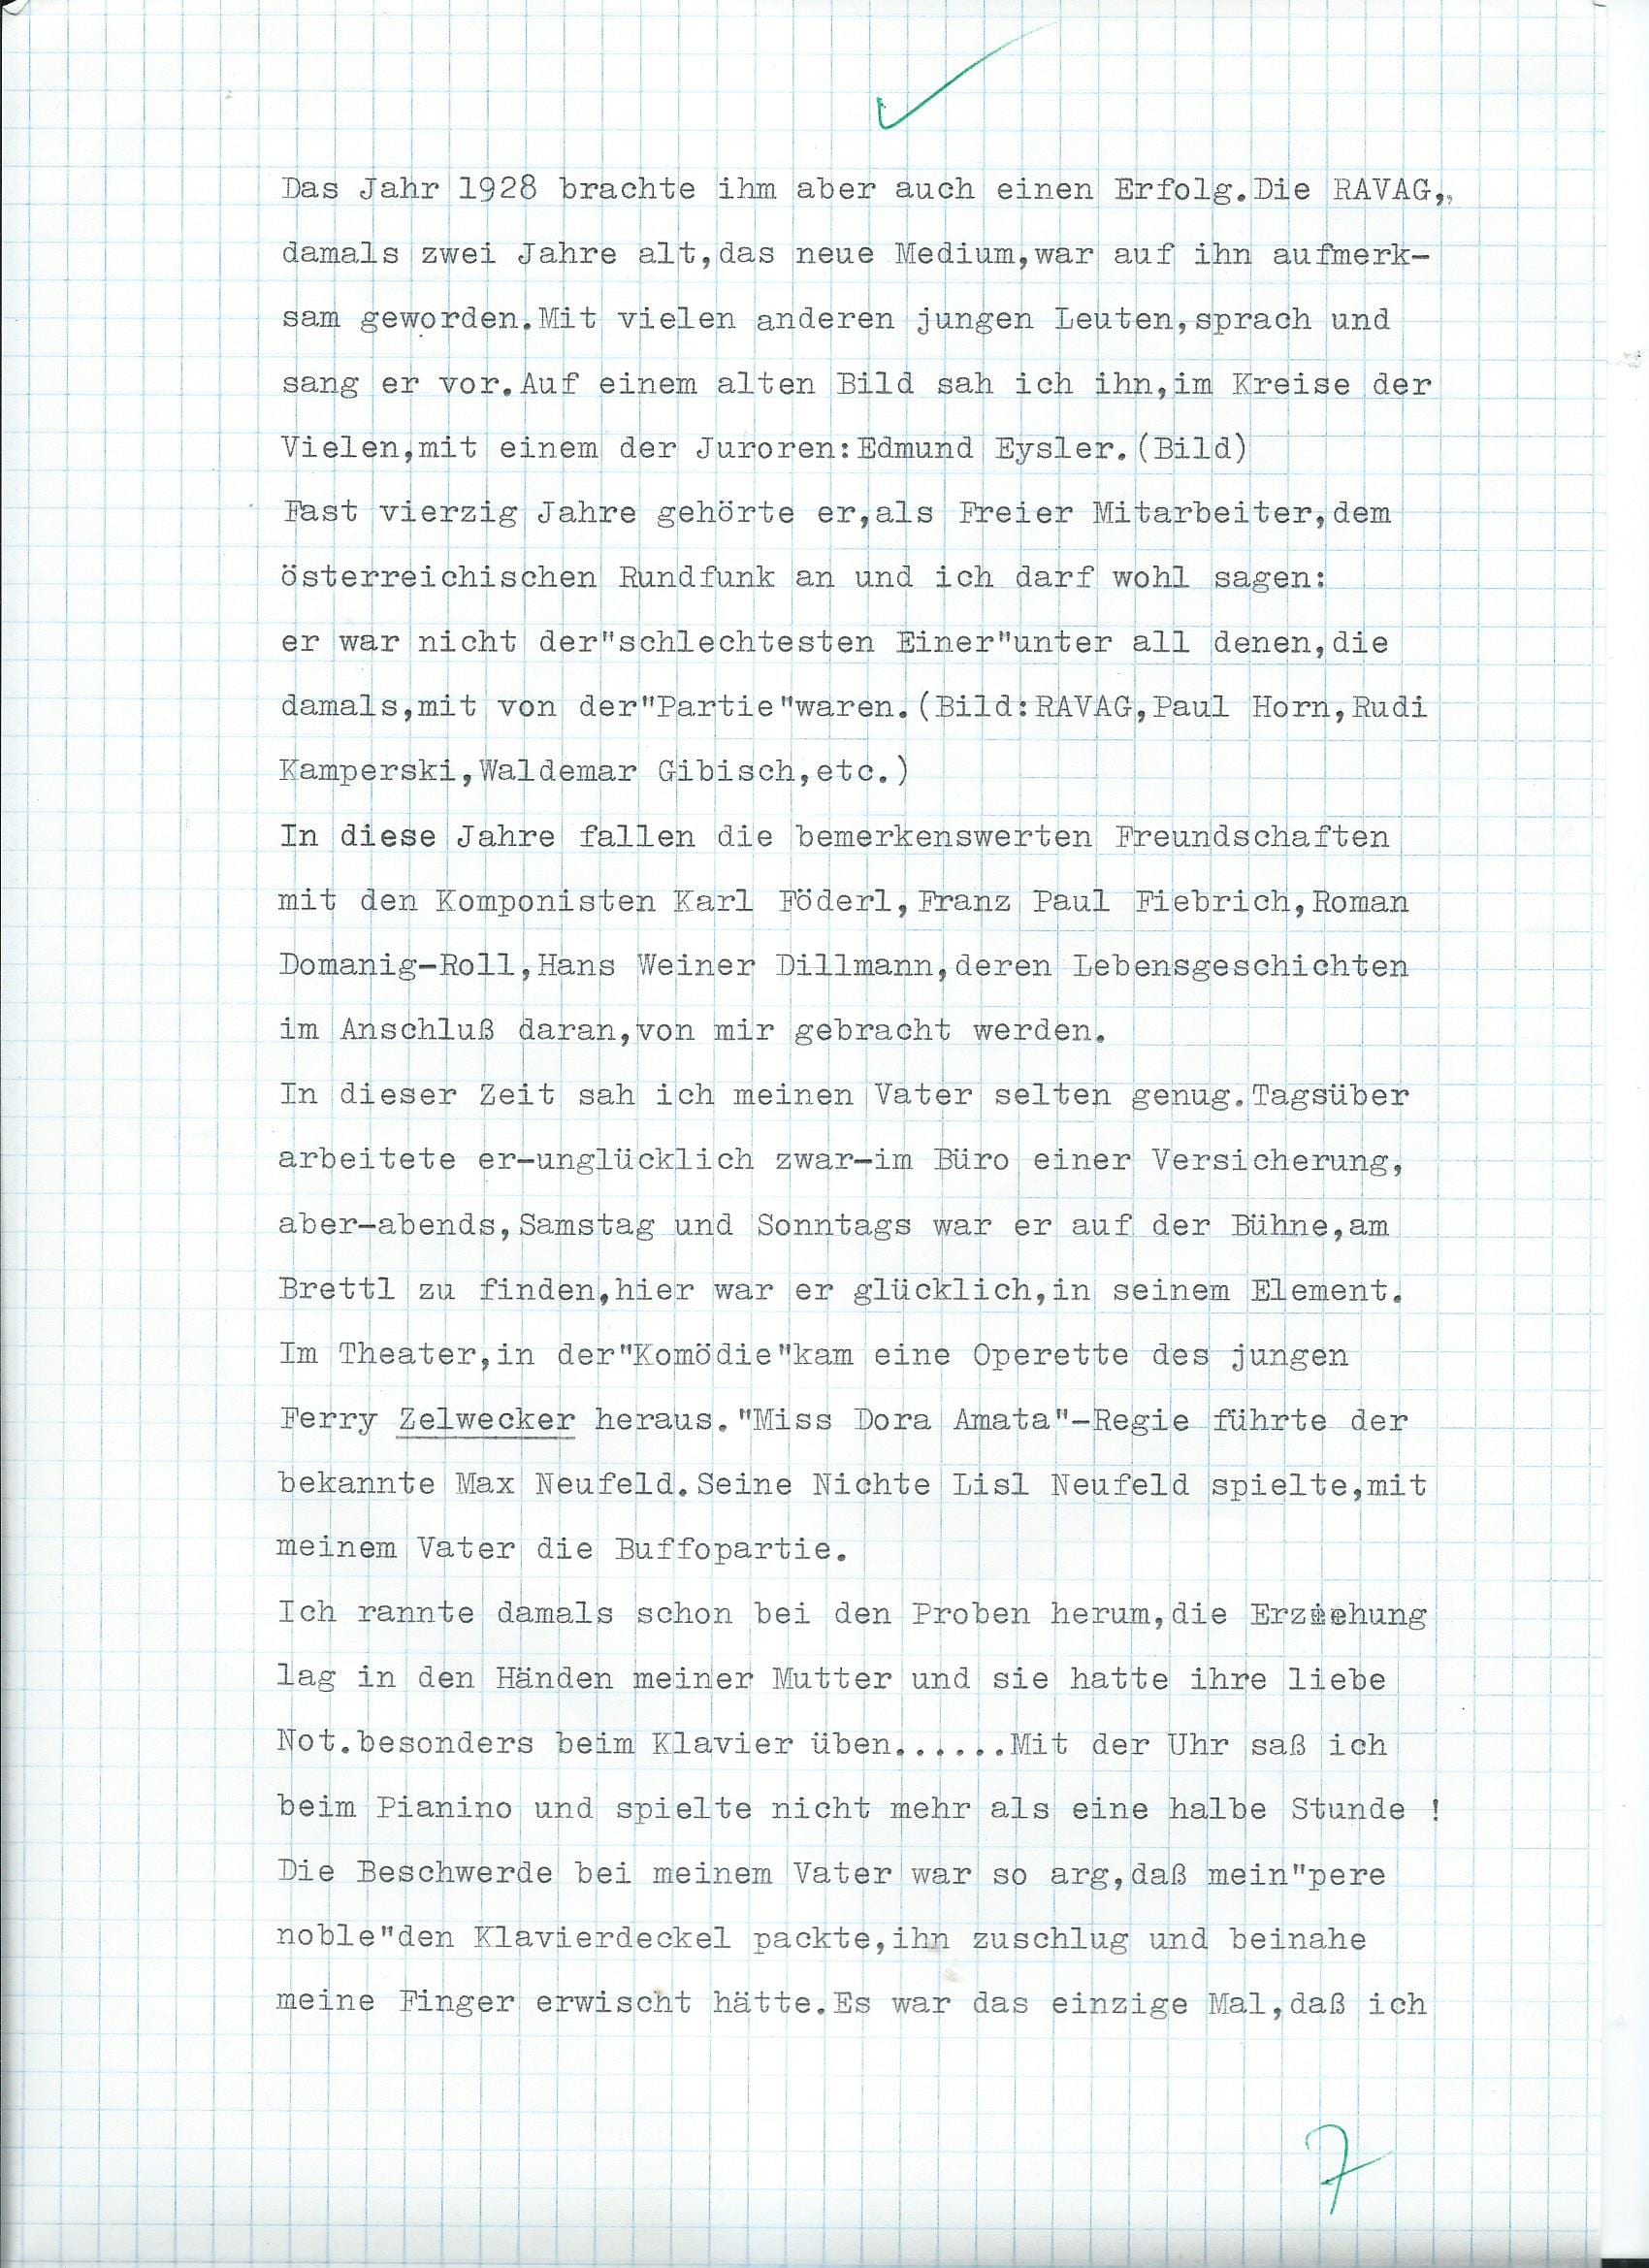 Emmerich ARLETH - Musik-Austria